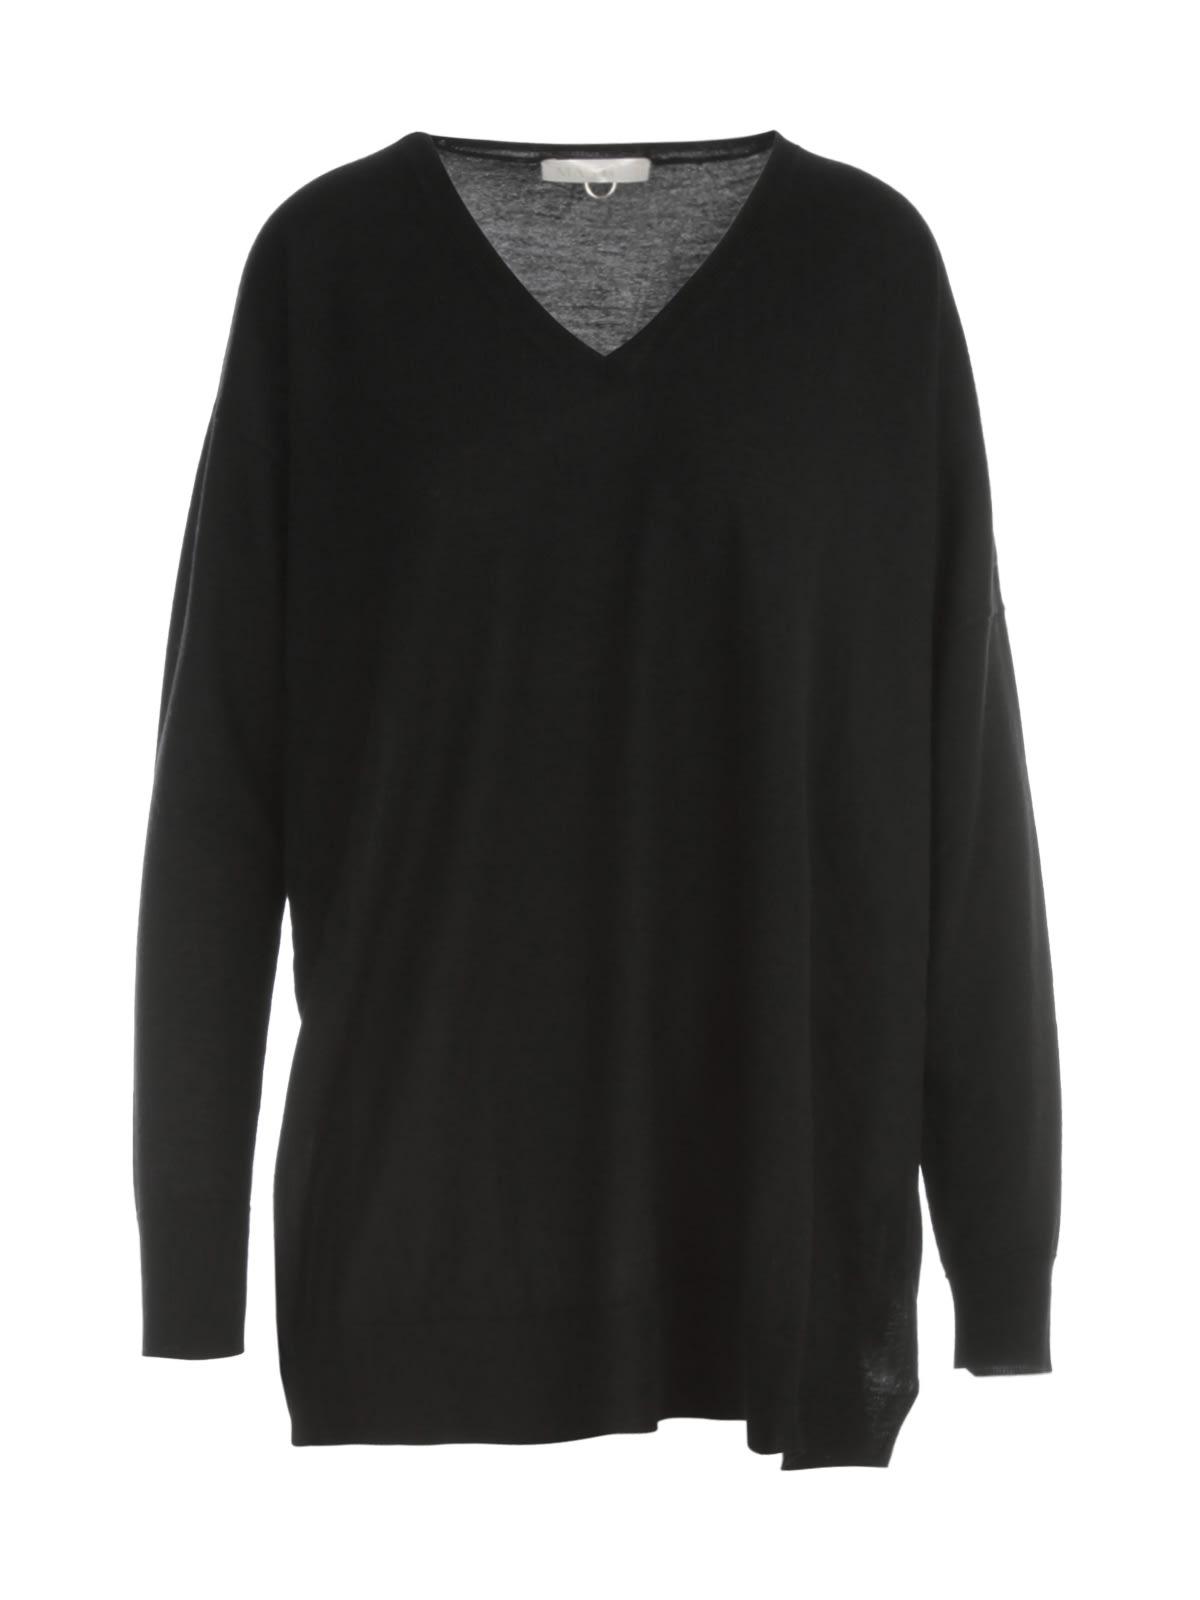 Asymmetrical V Neck L/s Sweater